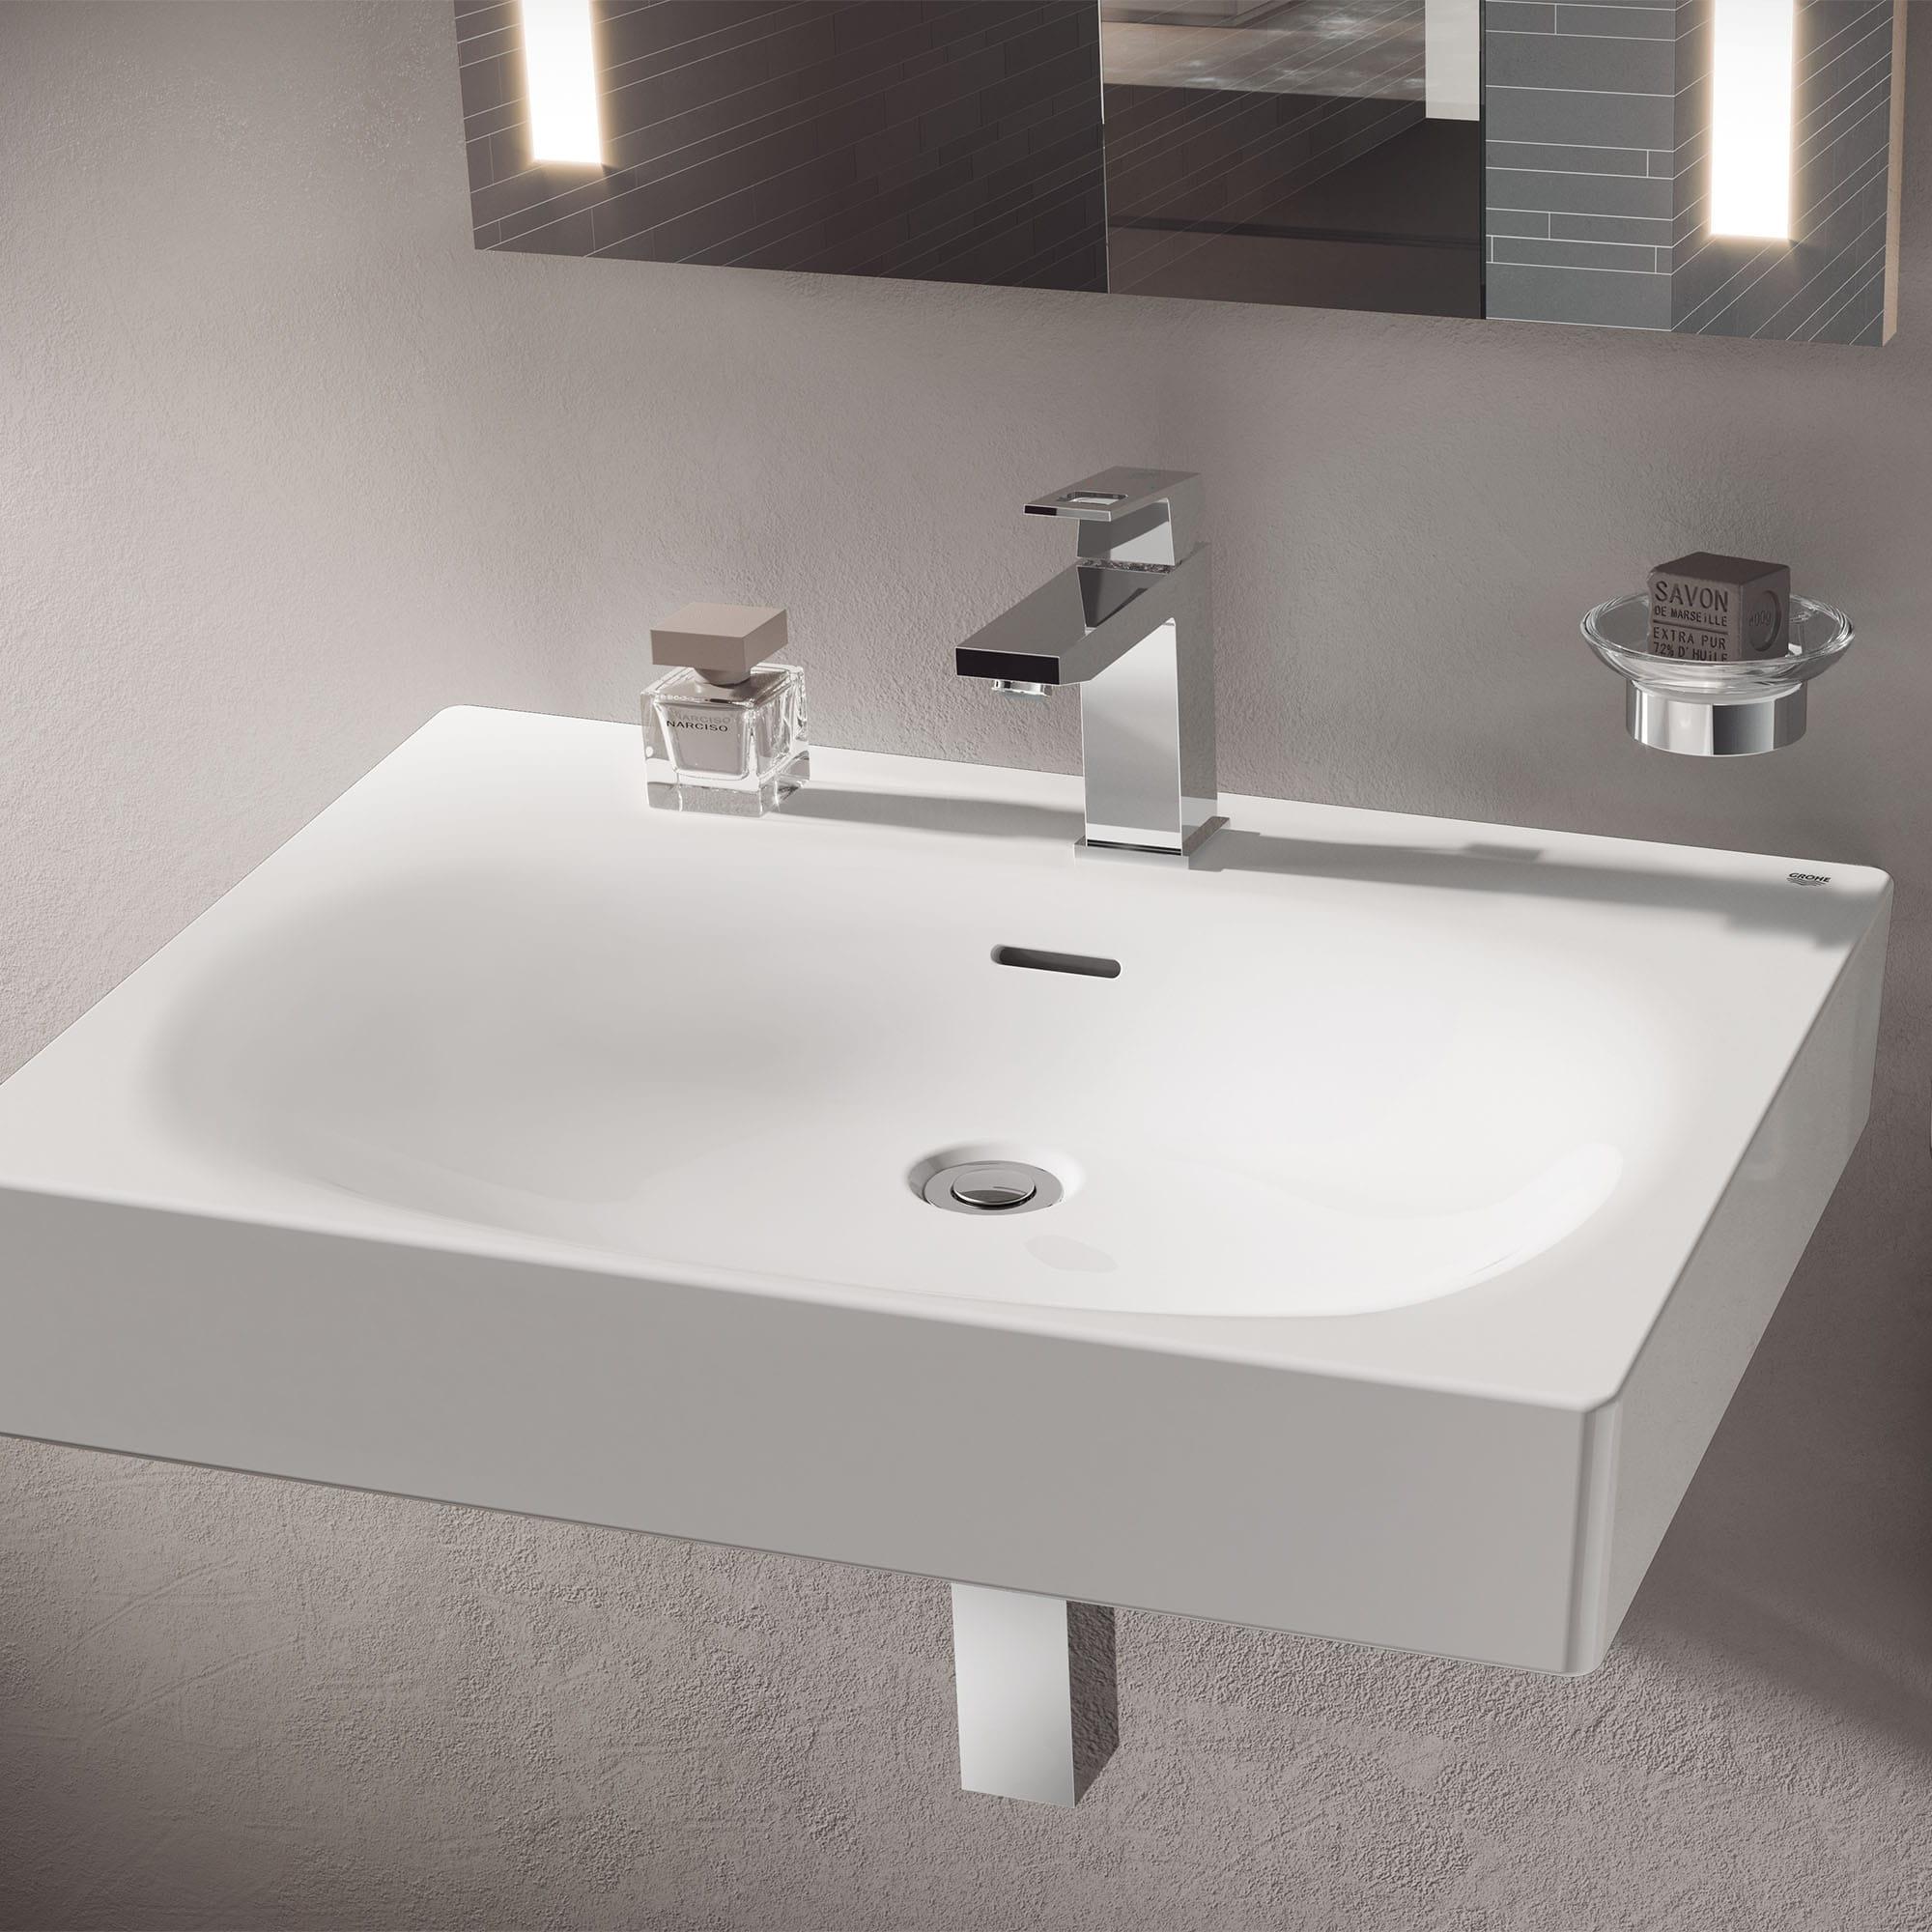 wall mount 24 bathroom sink 1 hole